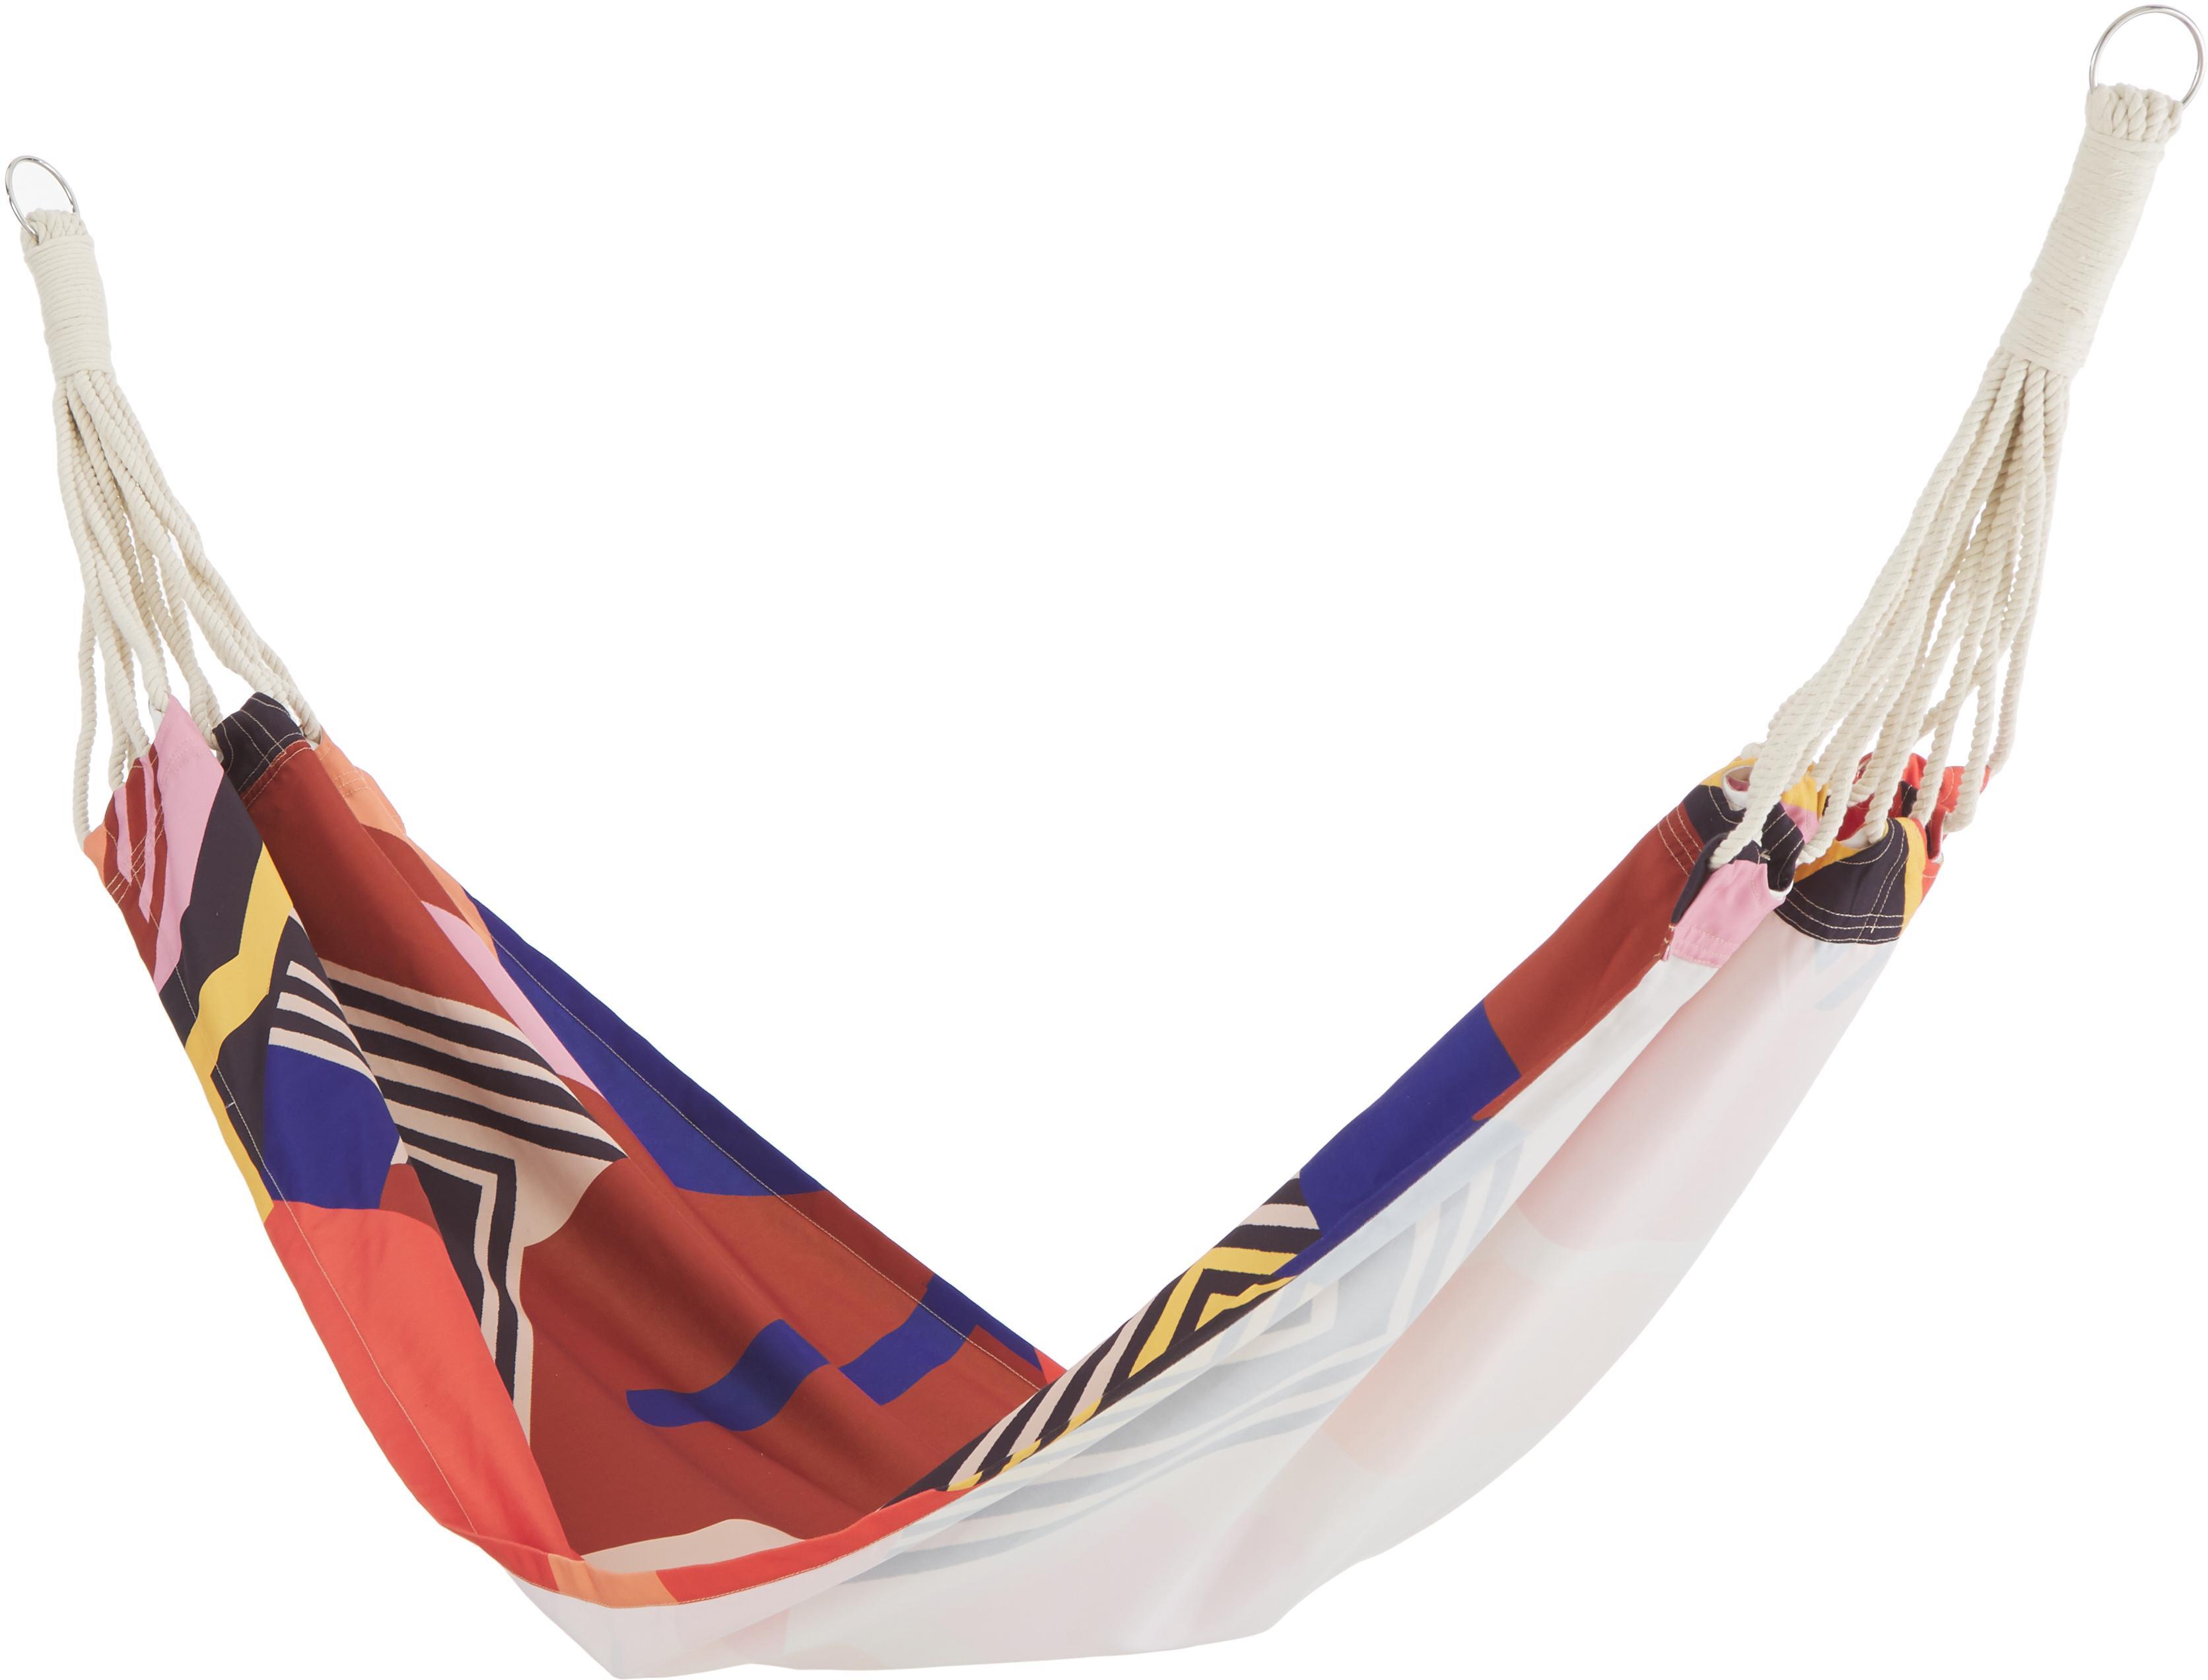 Hangmat Arti, Polyester, Multicolour, 80 x 180 cm